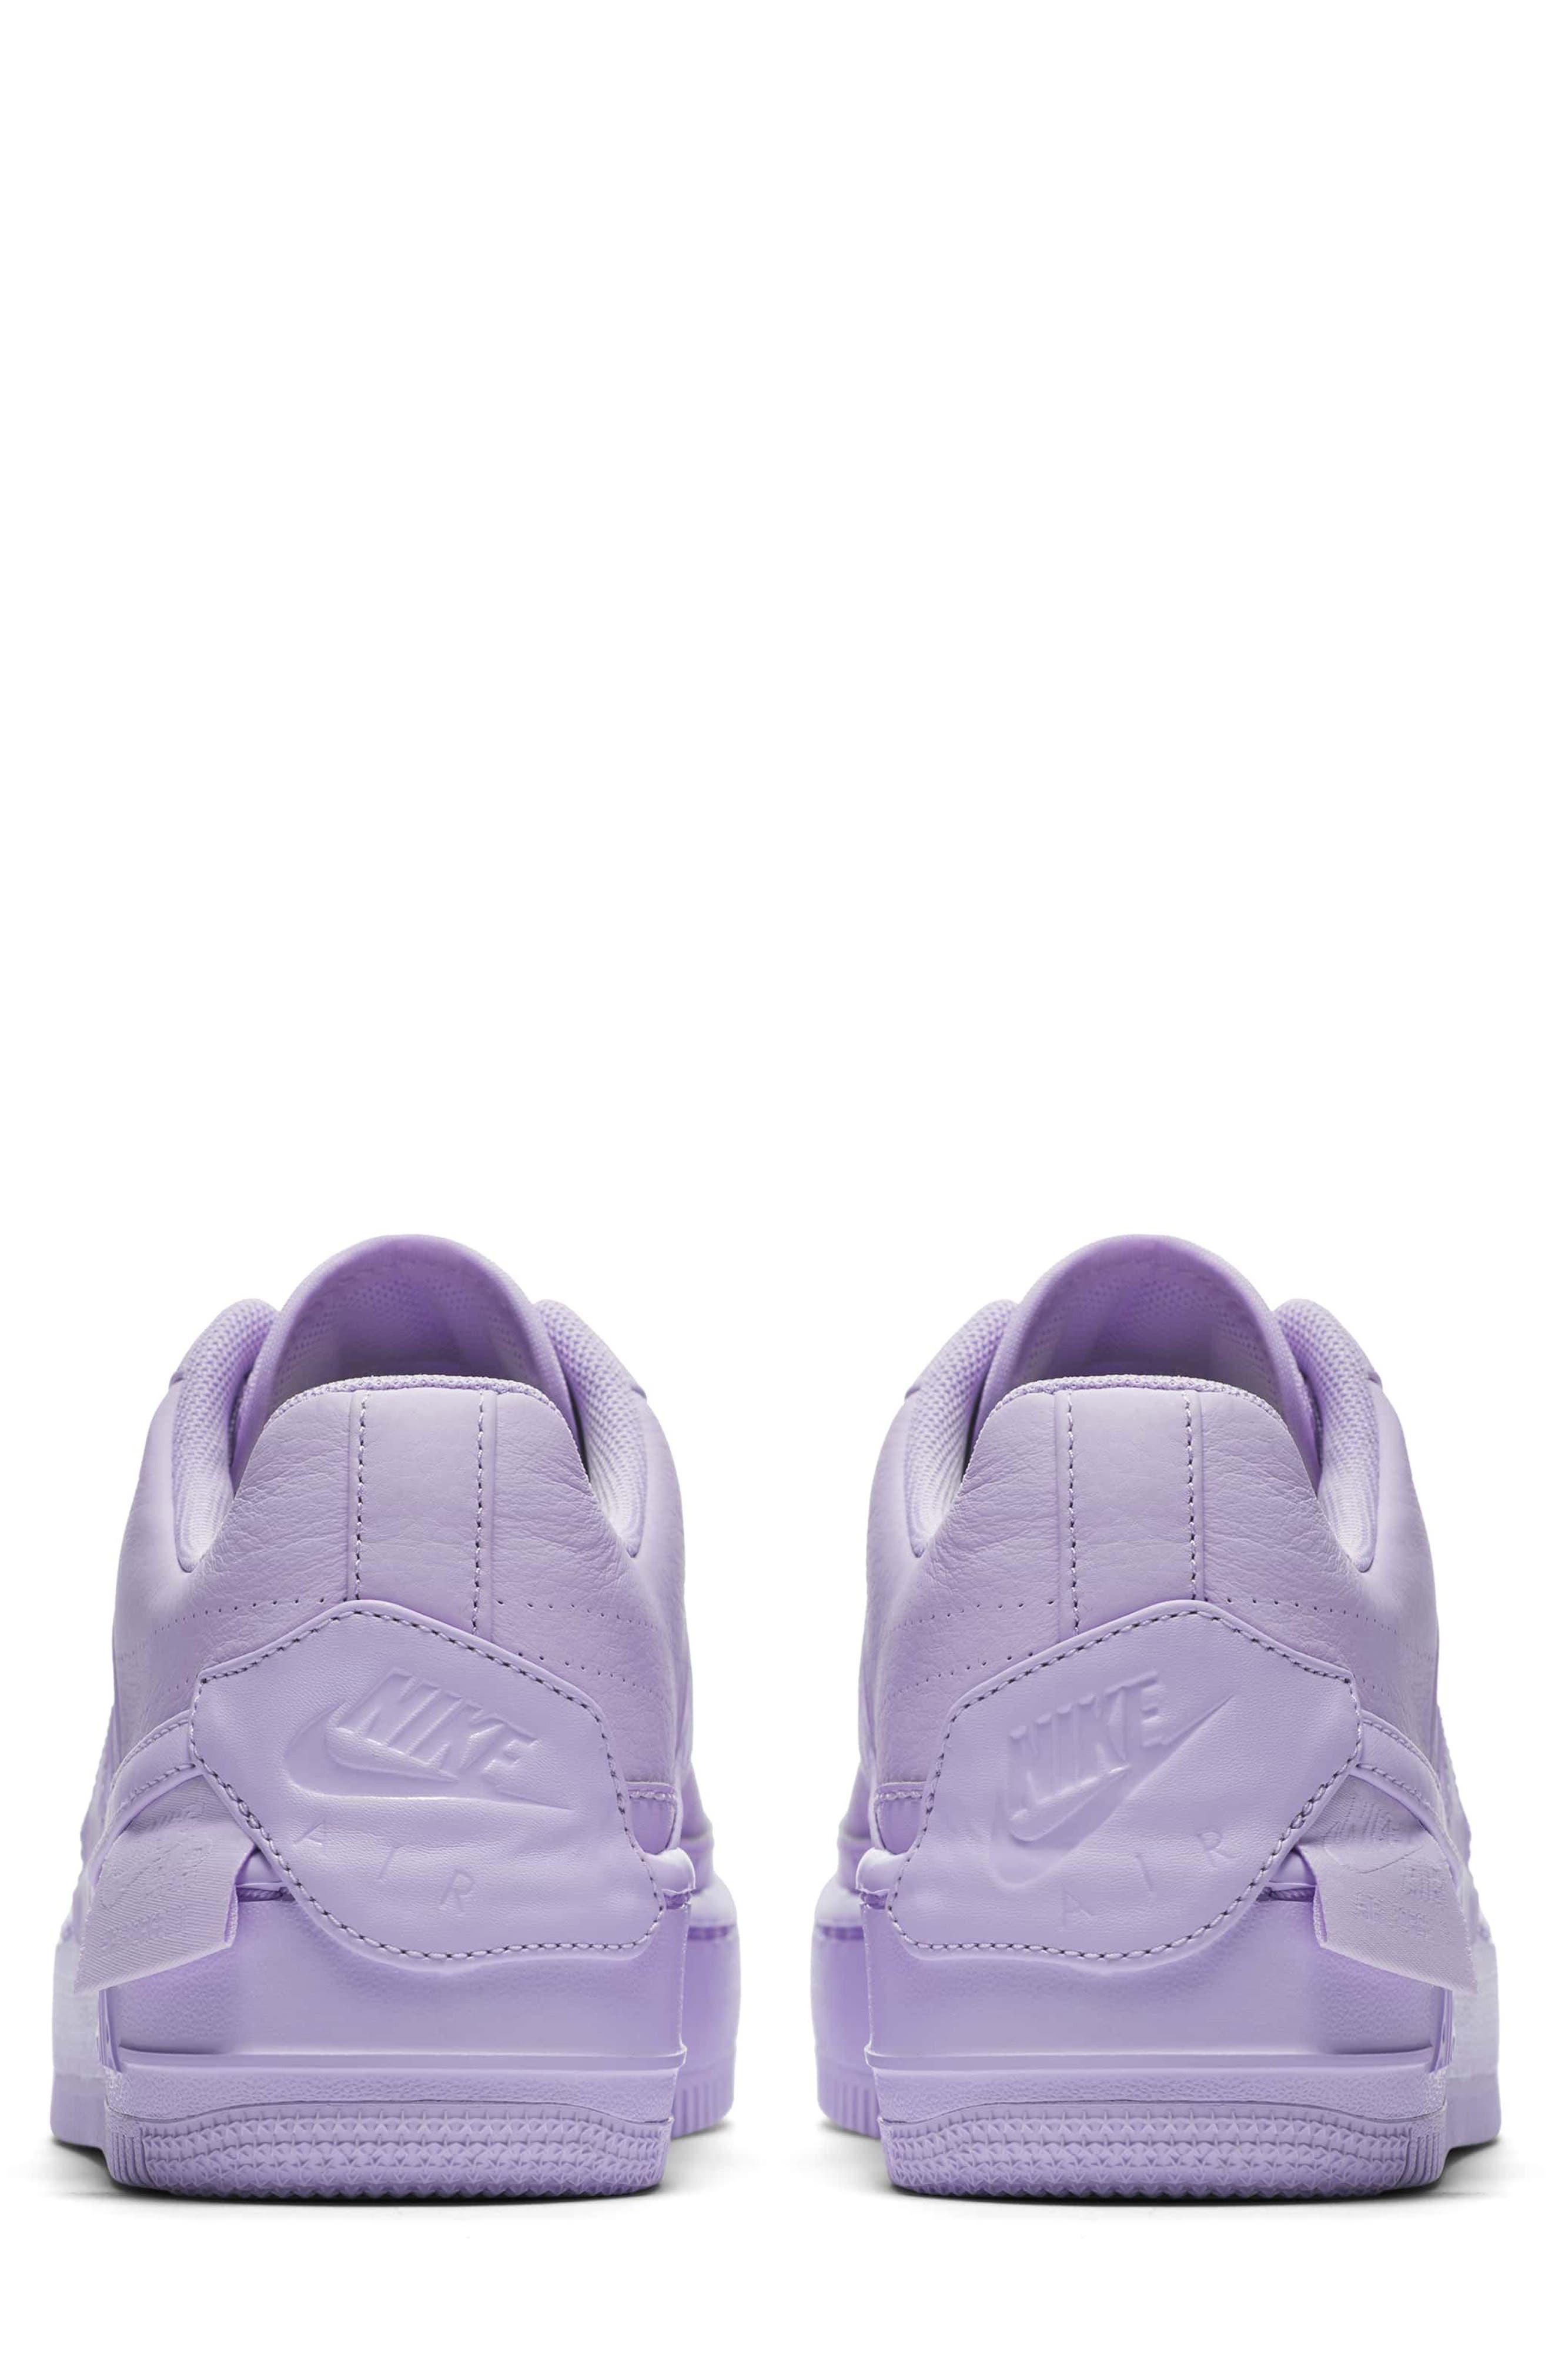 Air Force 1 Jester XX Sneaker,                             Alternate thumbnail 2, color,                             Violet Mist